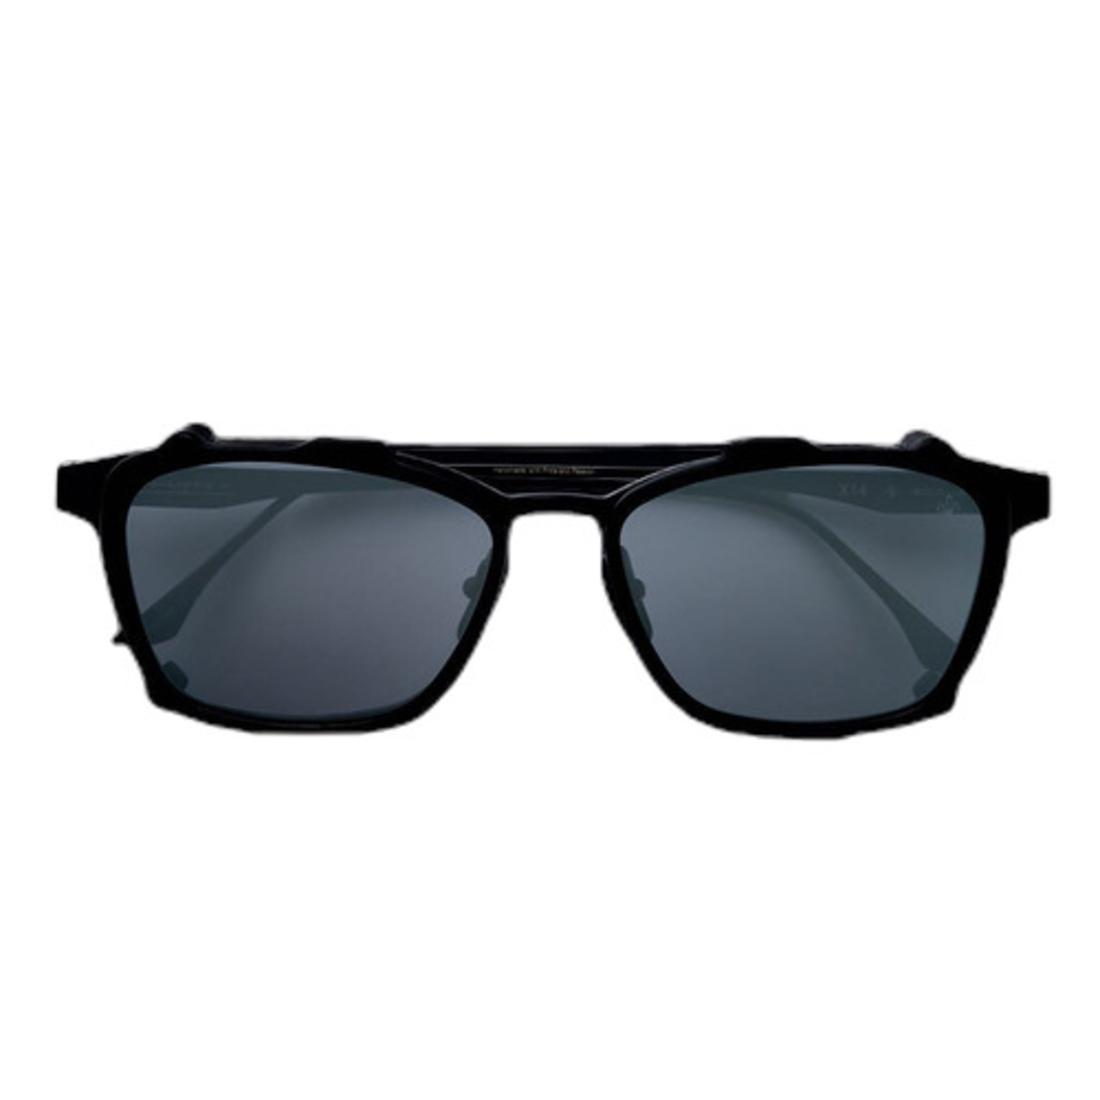 Philippe V Optical Frame Sunglasses clip on for Unisex eyewear eyeglasses | Philippe V X14